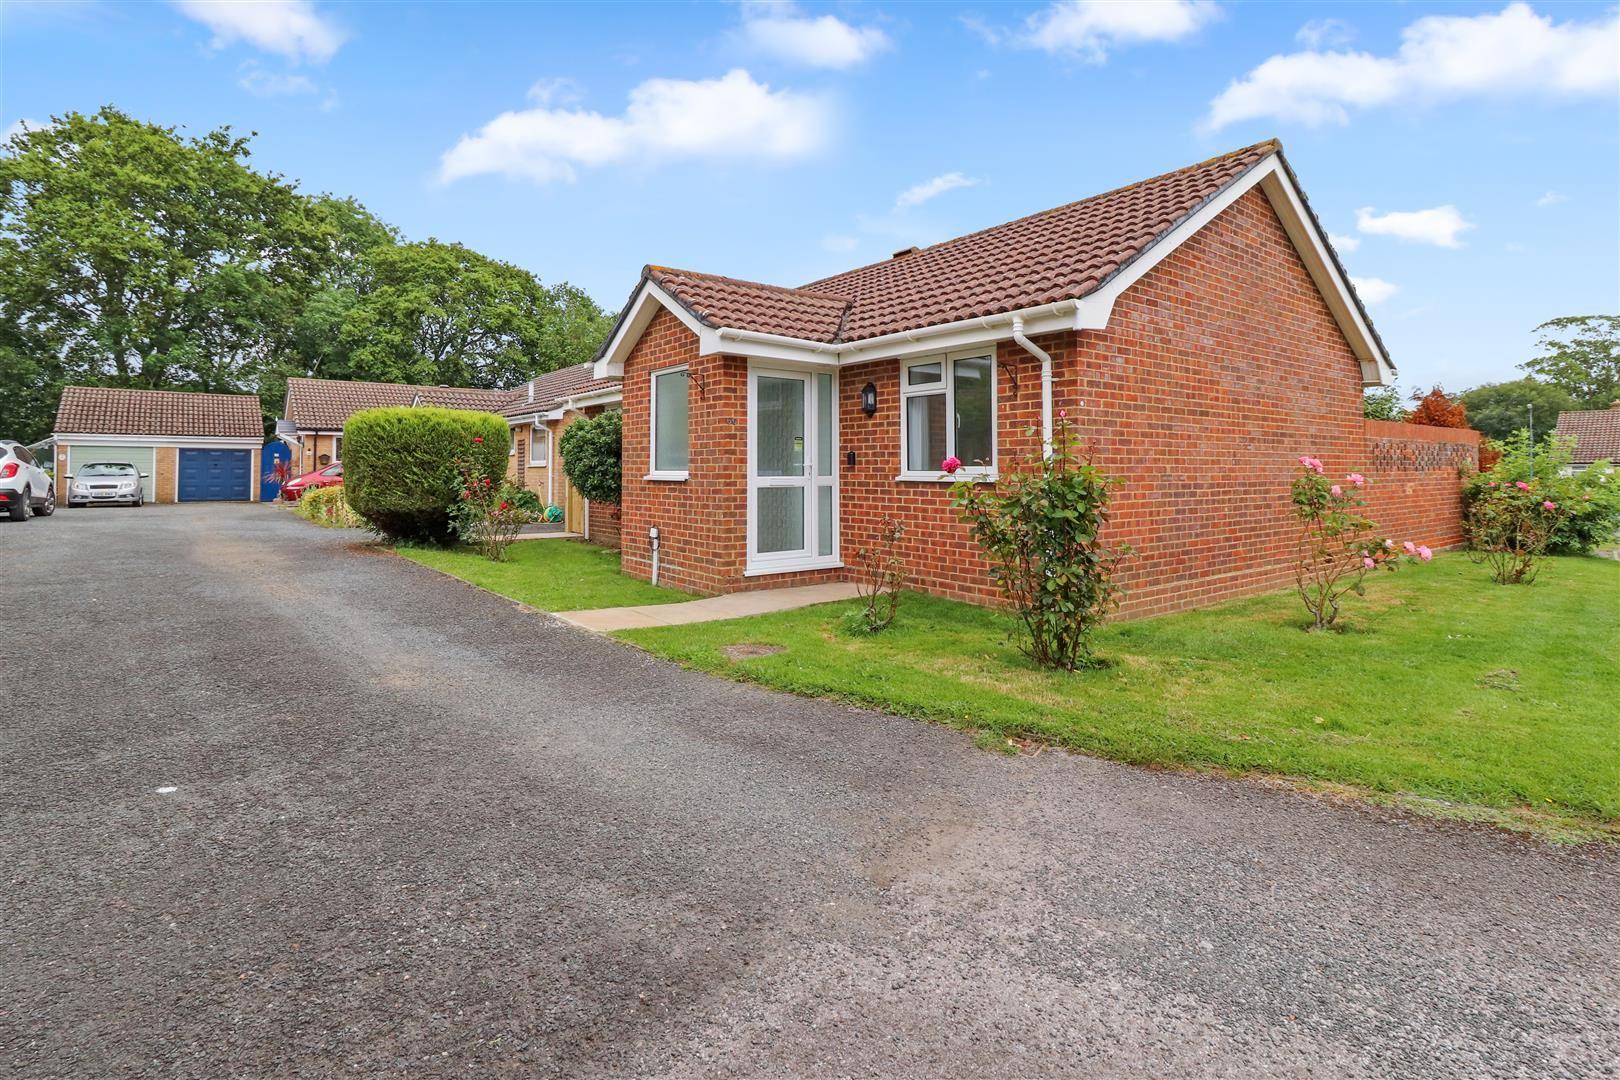 Property photo 1 of 17. 20210714091219_Img_2080.Jpg